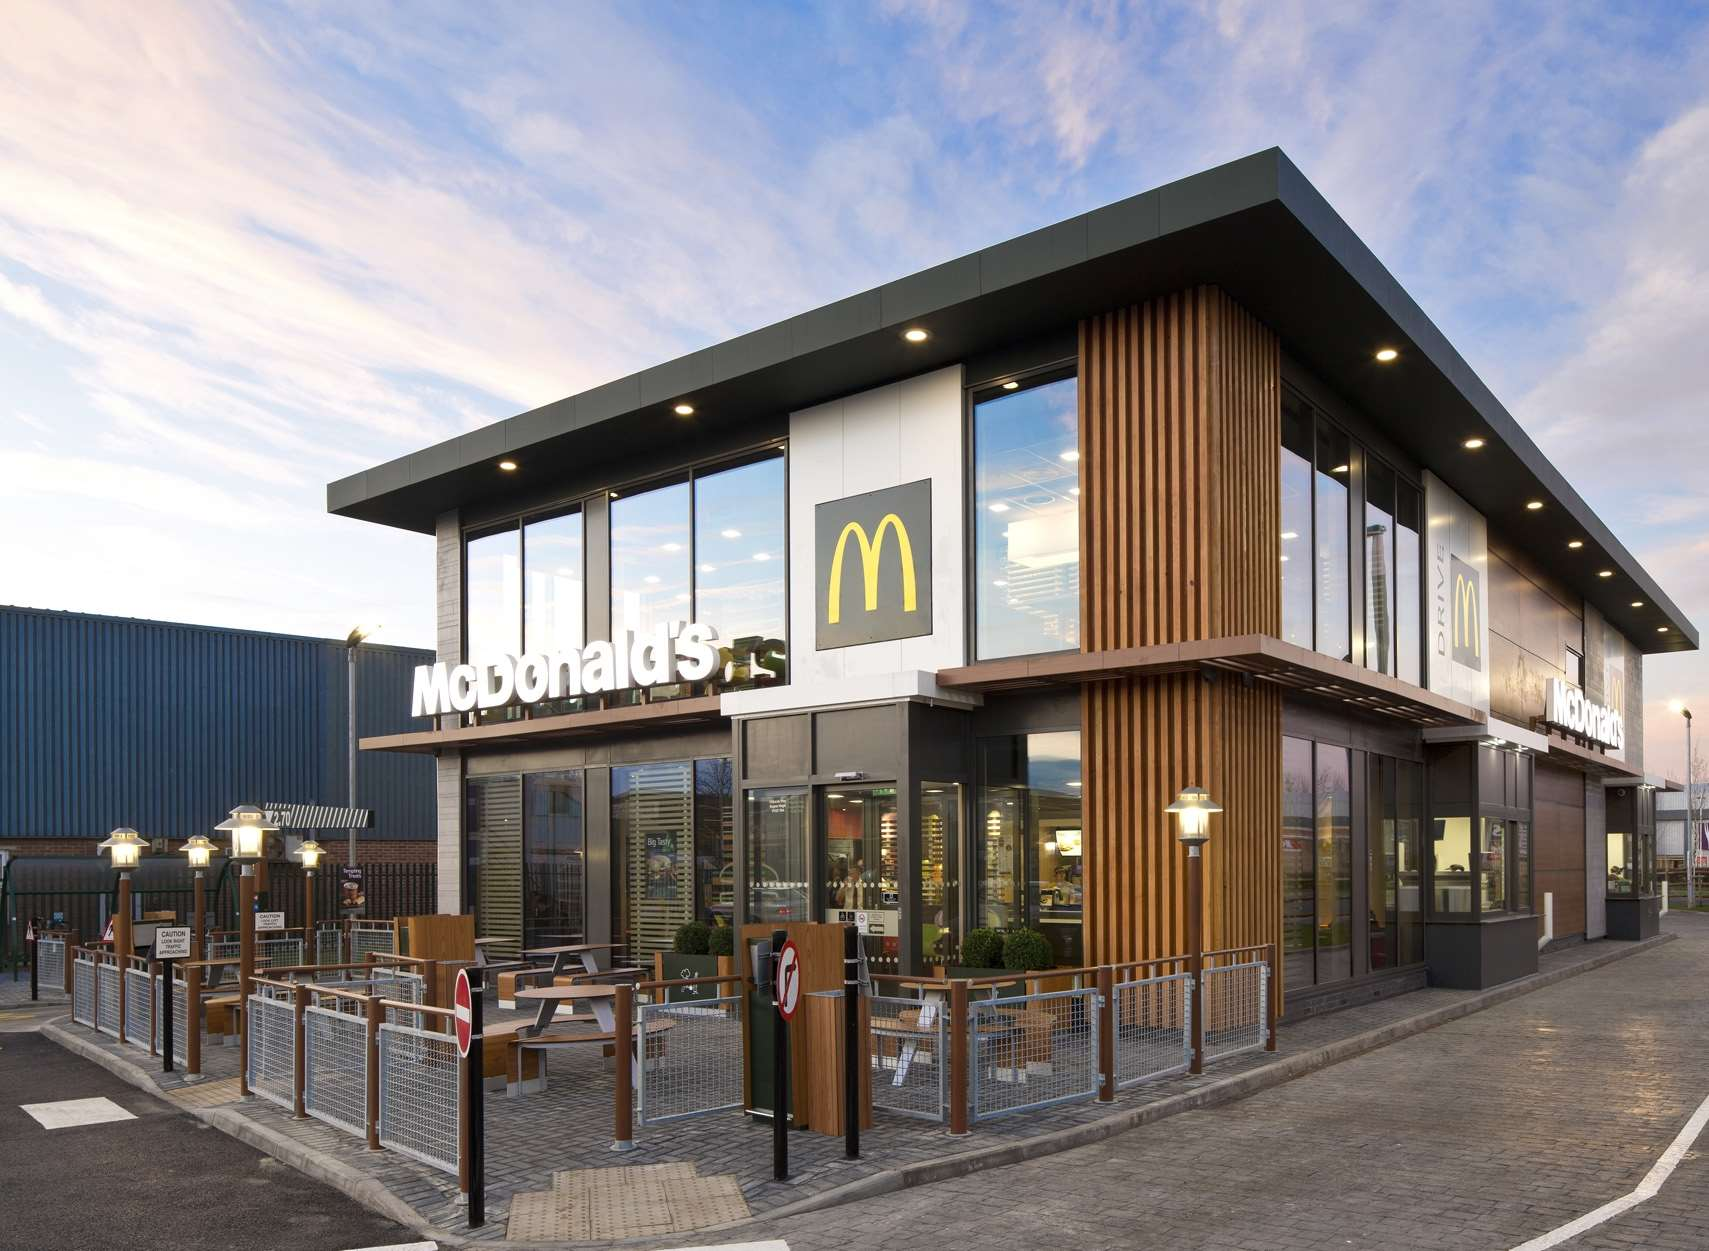 Mcdonalds Restaurant In Cannon Lane Tonbridge Given Approval